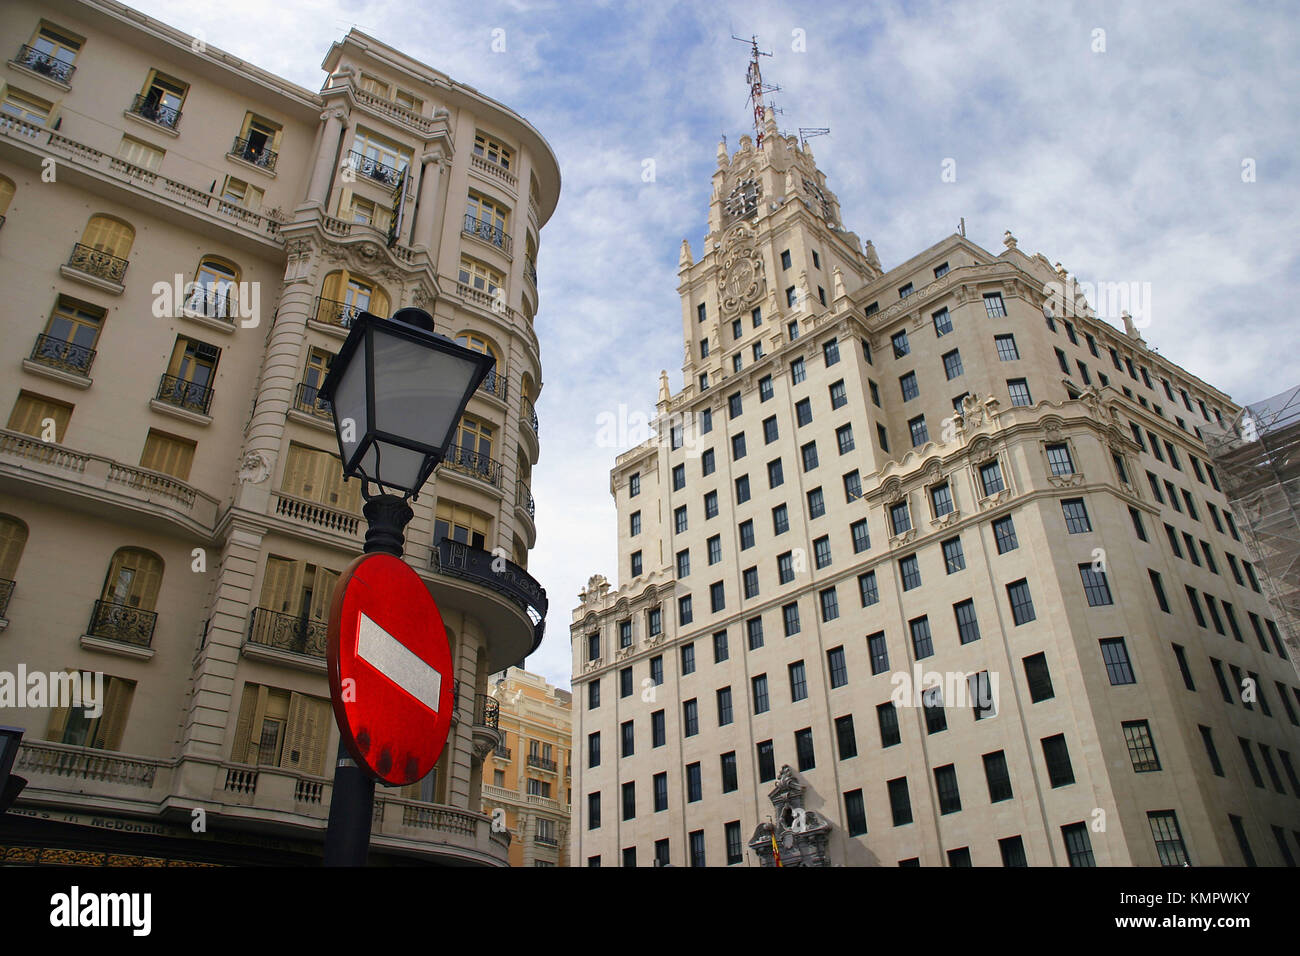 Telefonica phone company building, Gran Via. Madrid. Spain - Stock Image